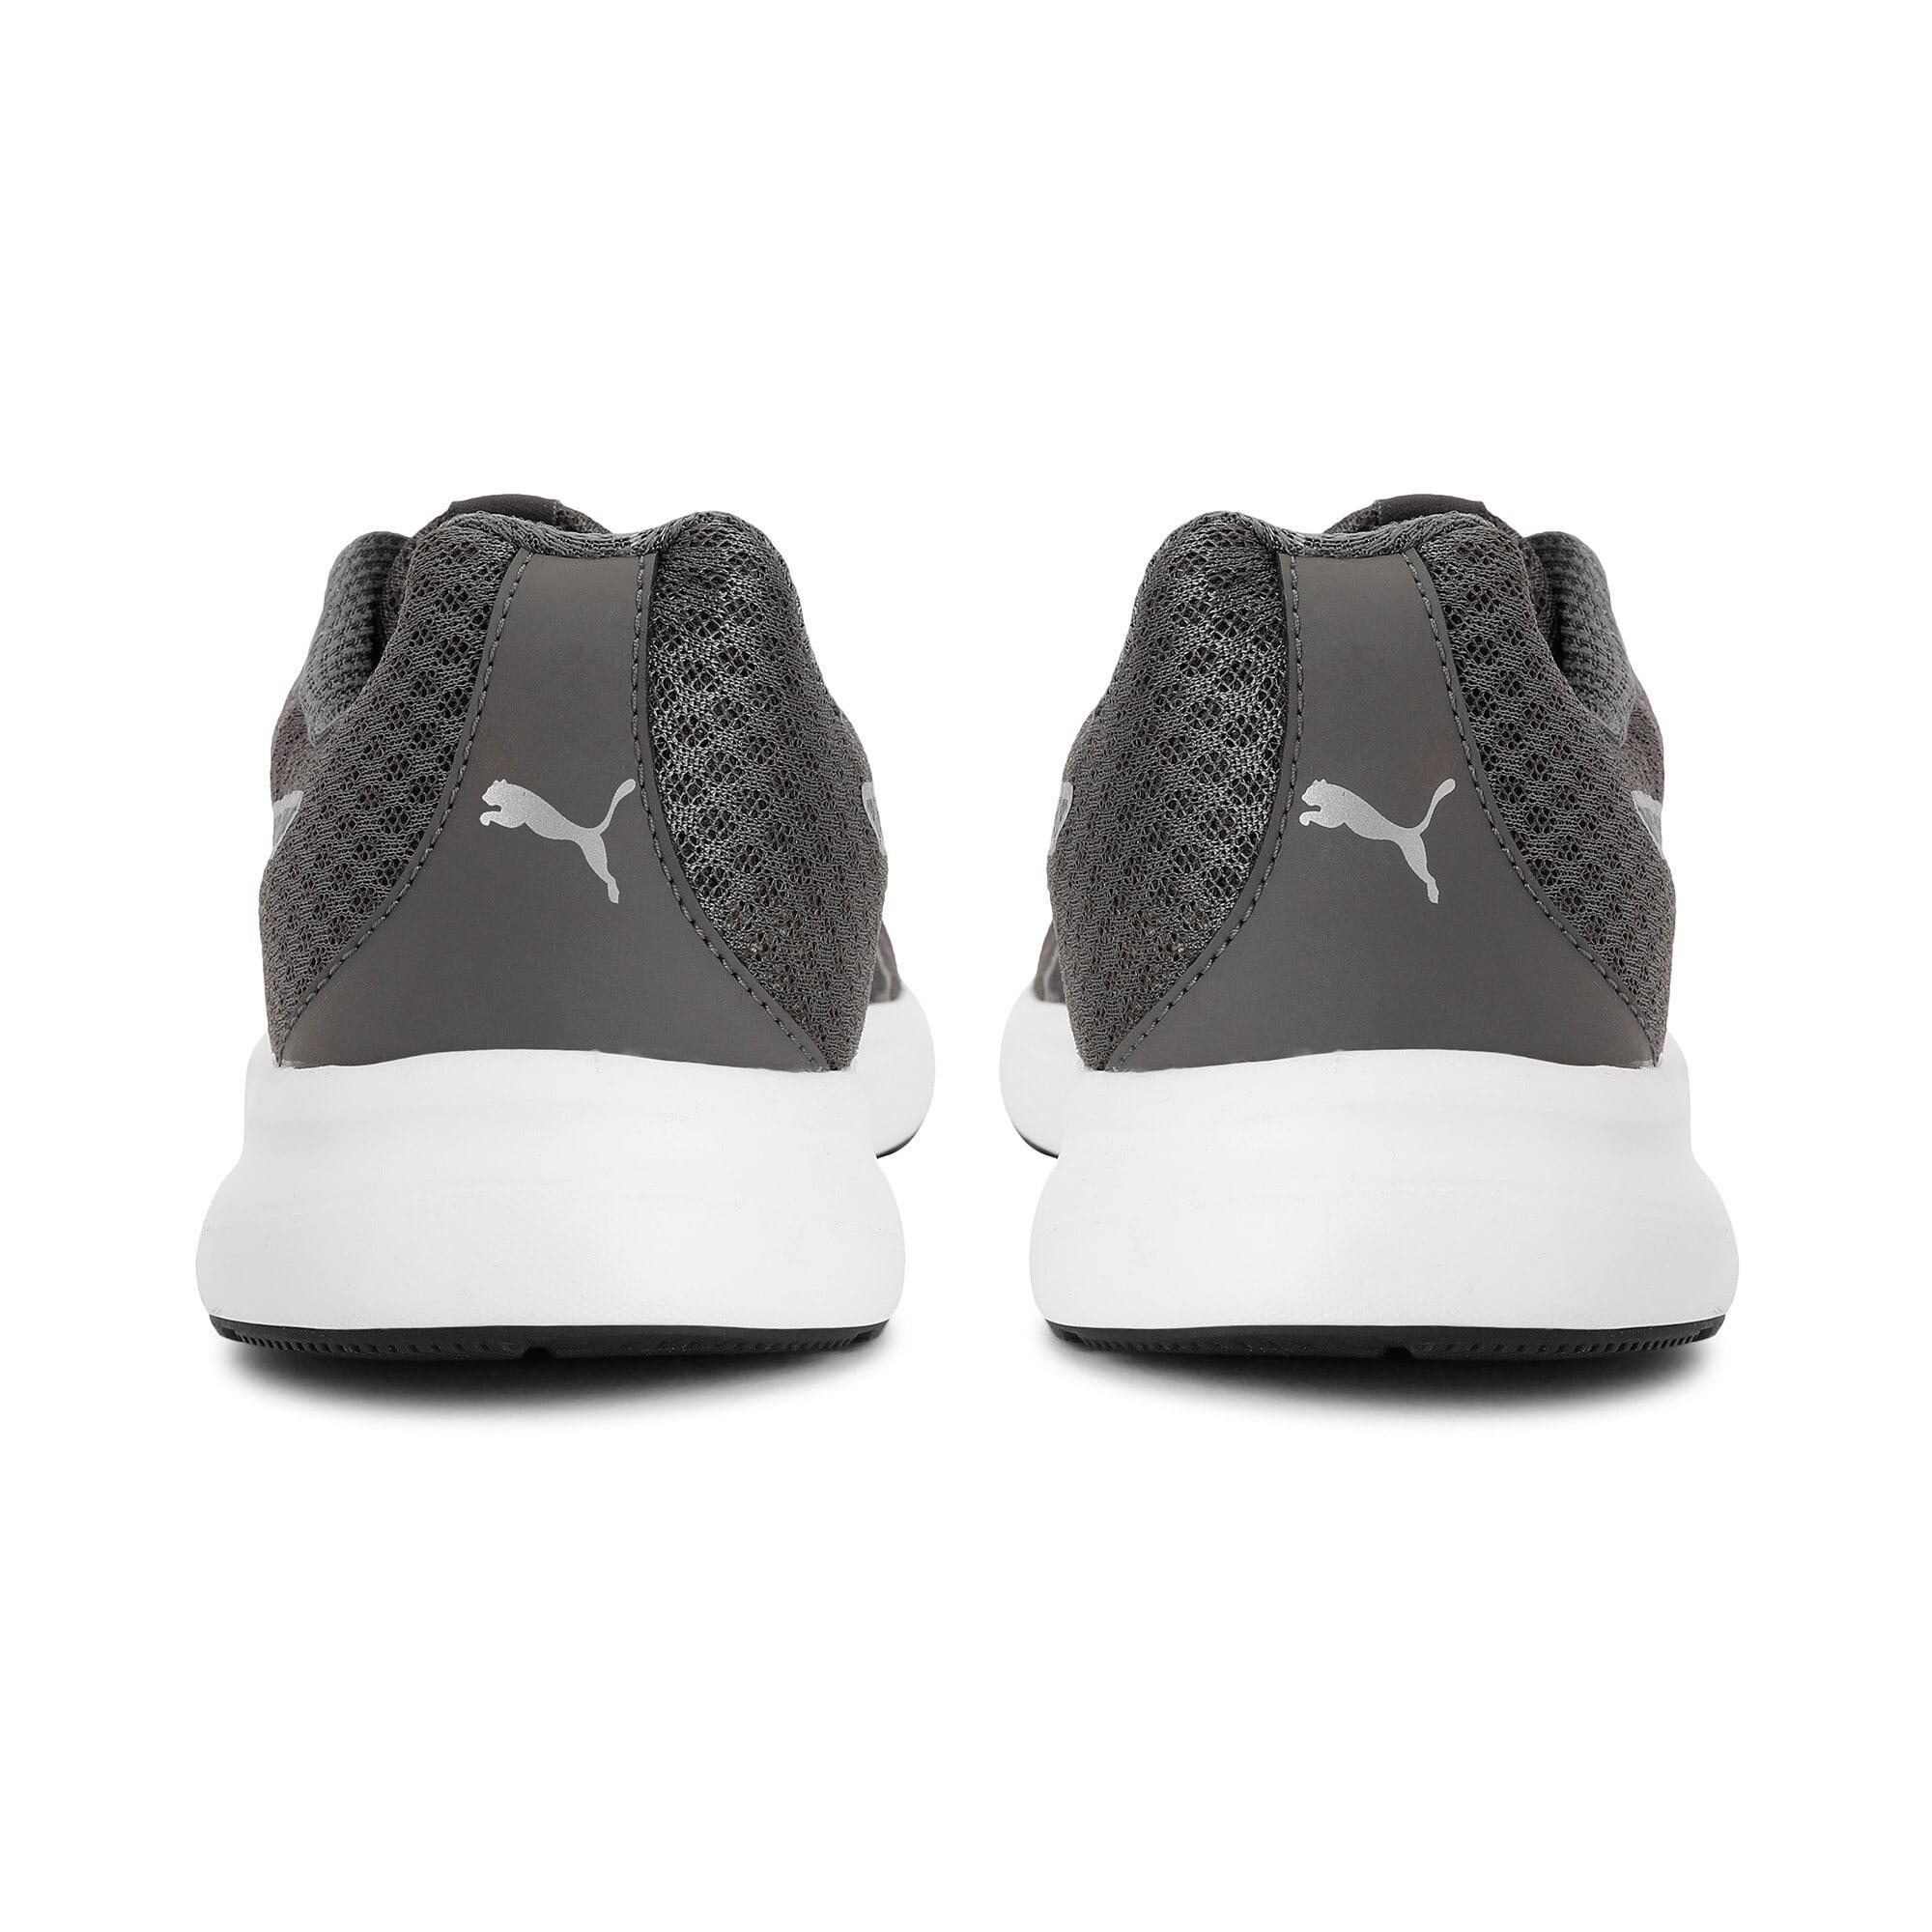 Thumbnail 3 of Propel EL IDP Men's Sportstyle Shoes, Asphalt-Silver-White-Black, medium-IND